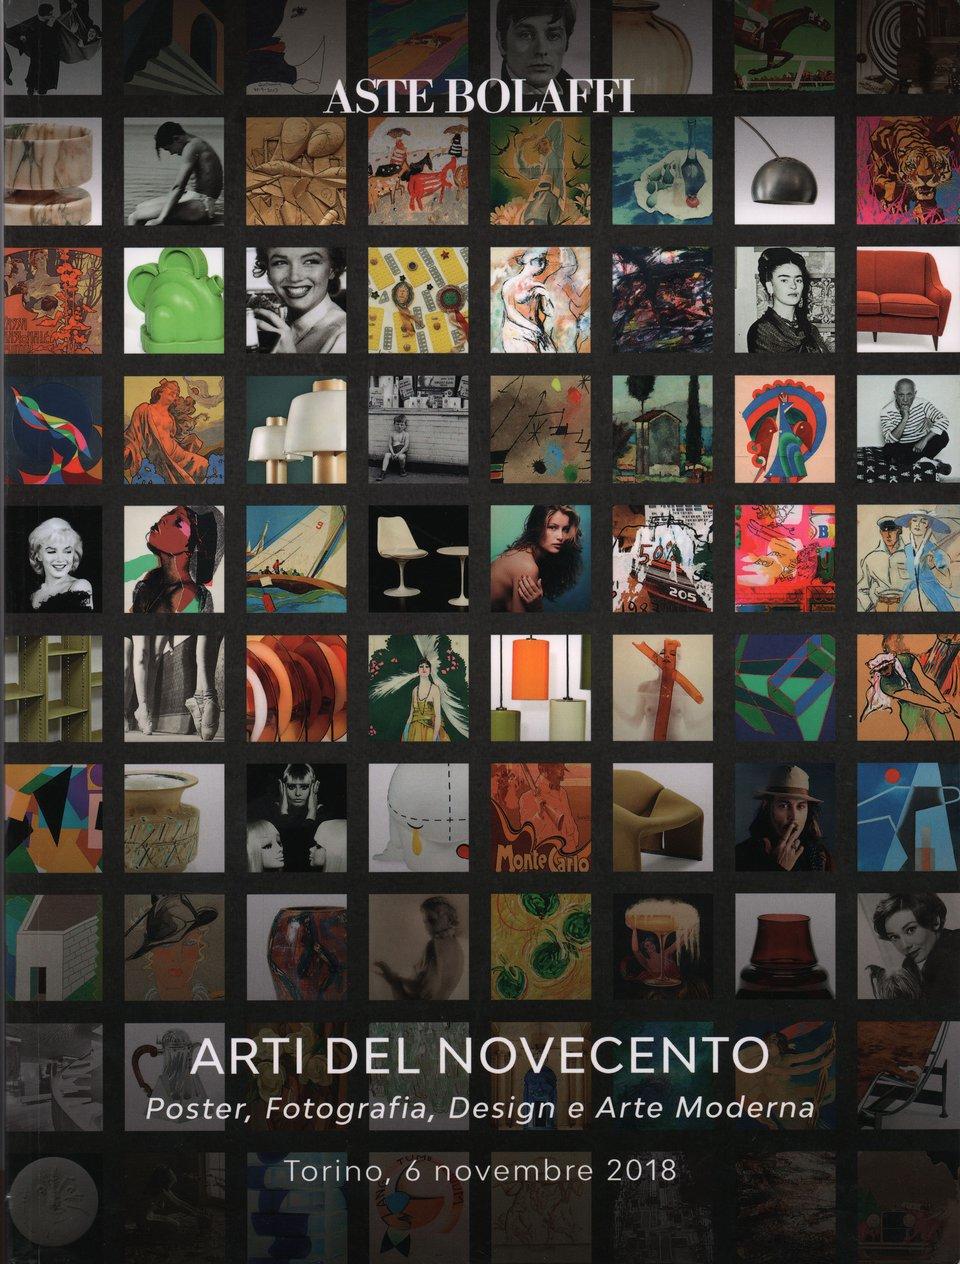 Arti Del Novecento: Poster, Fotografia, Design E Arte Moderna 2018 Italian Catalog